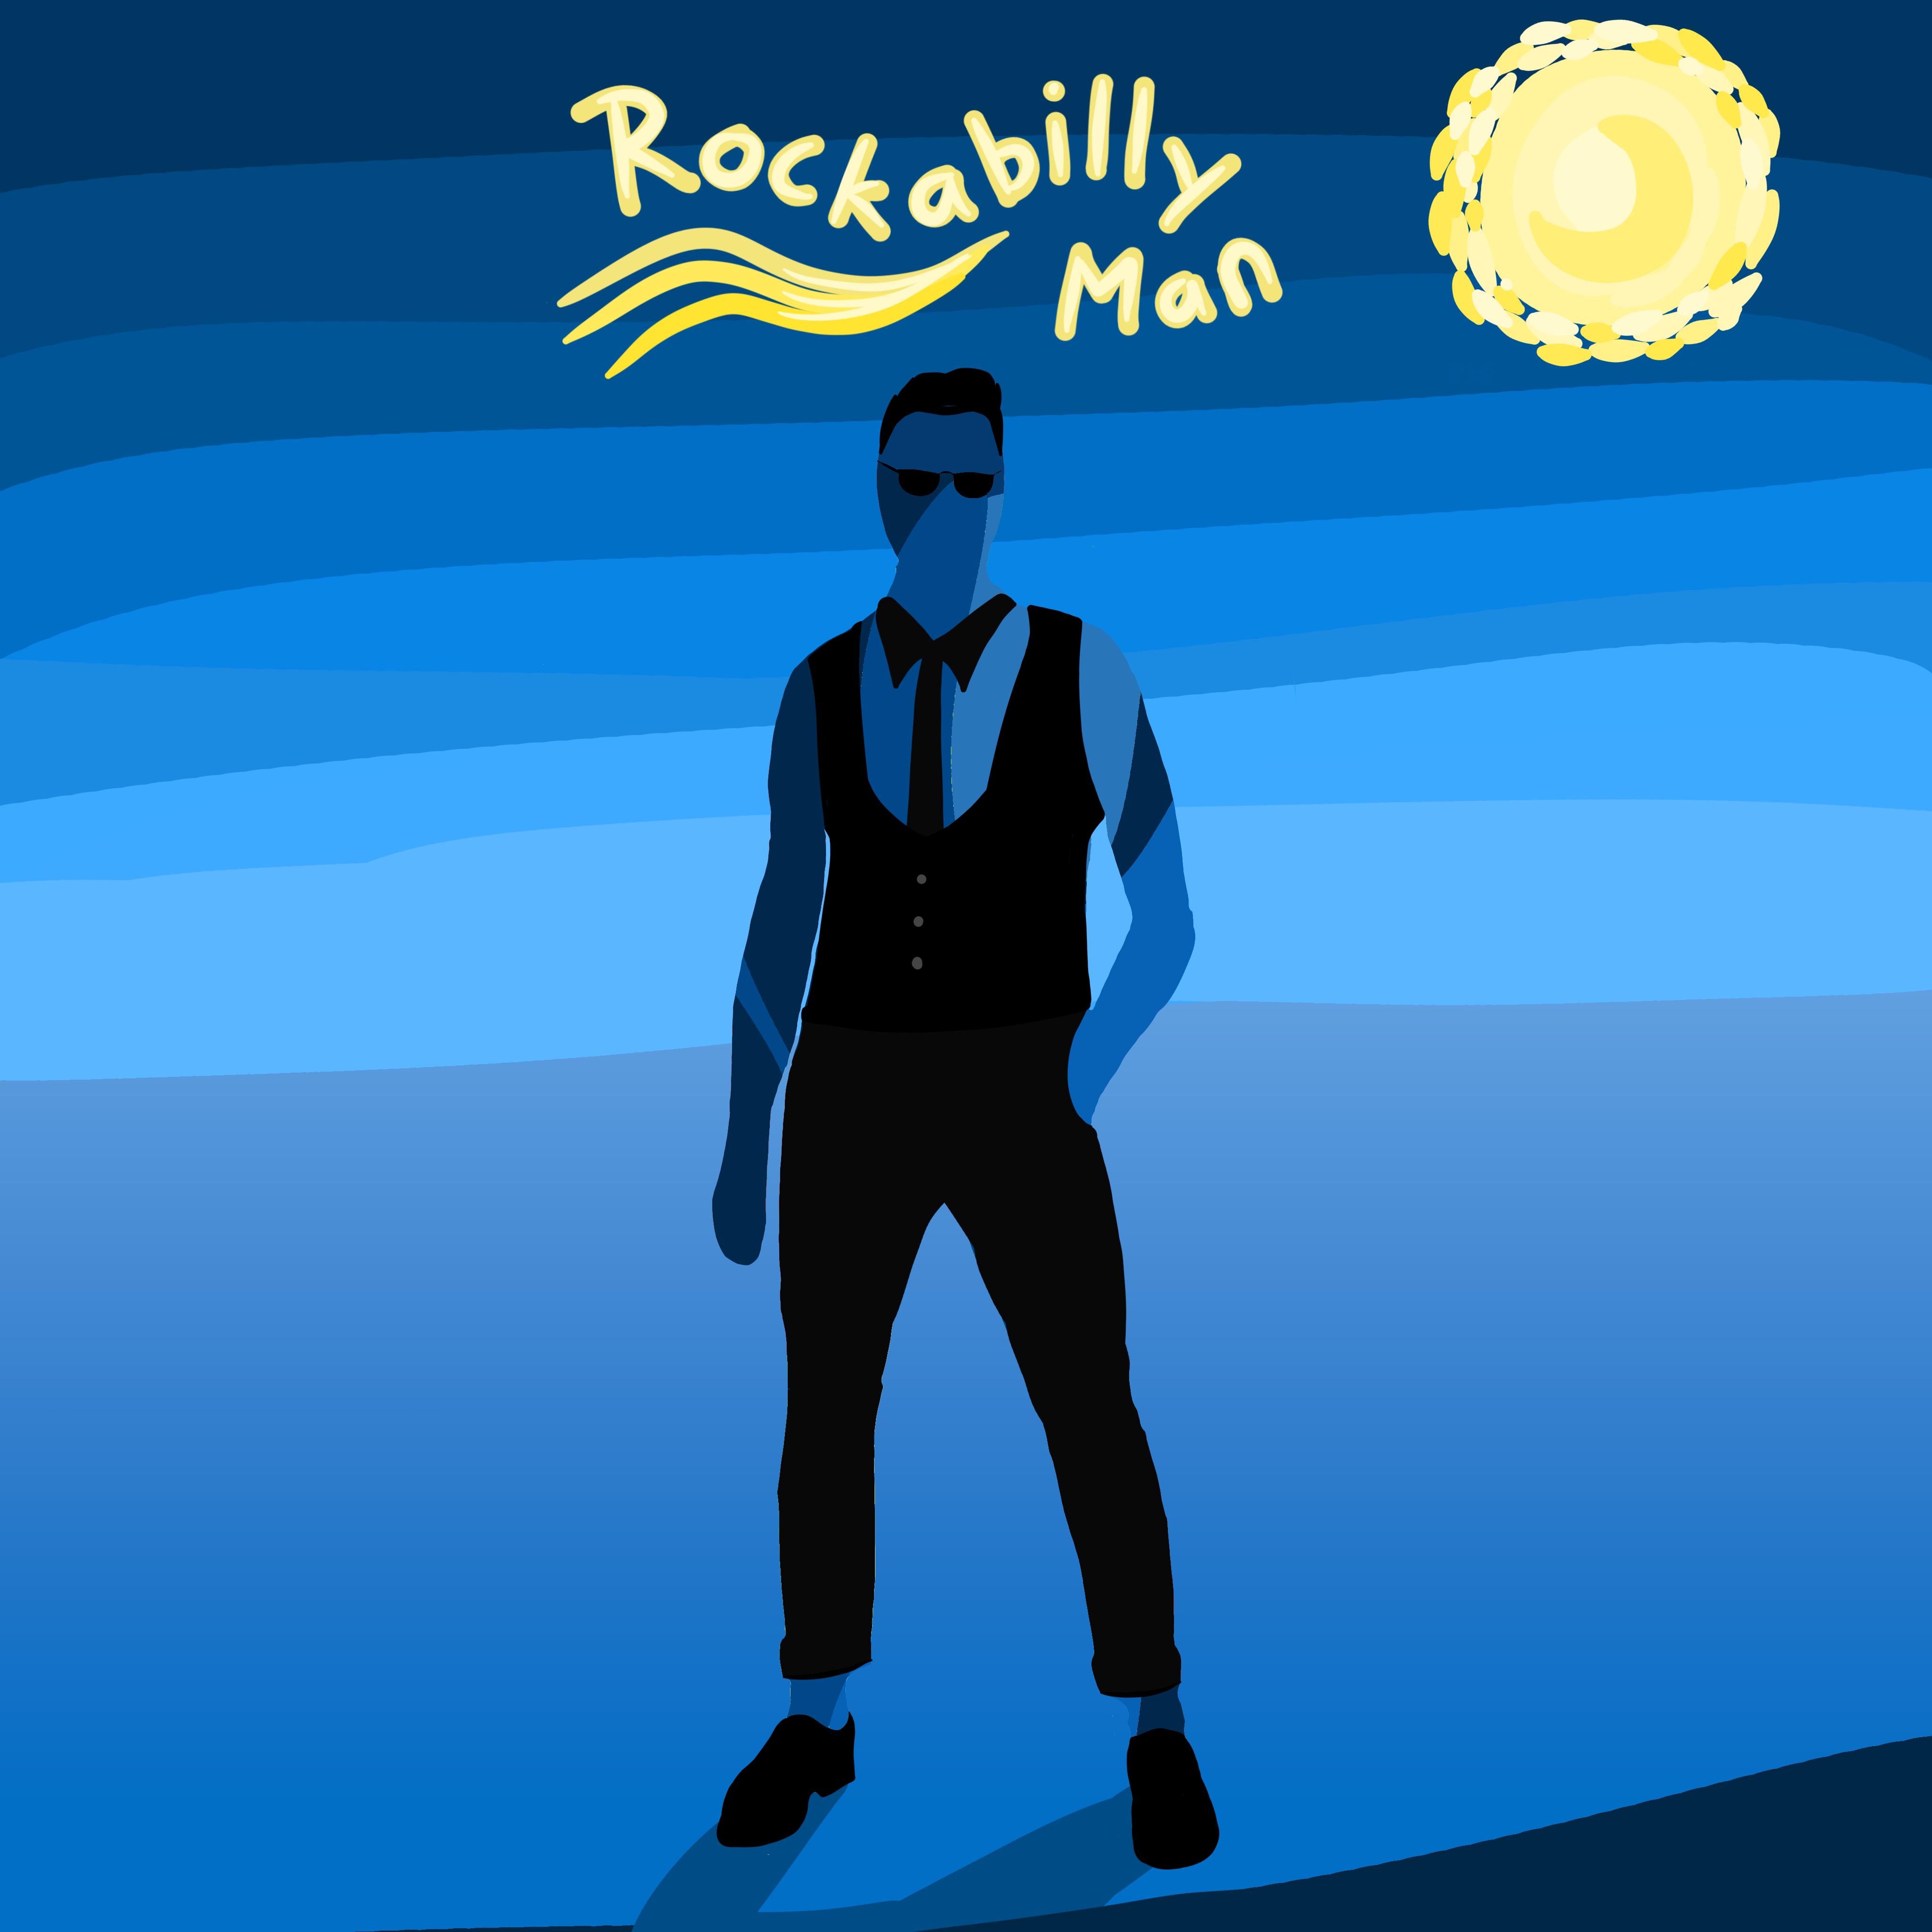 The Senior High School Release Rockabilly Man Video Clip